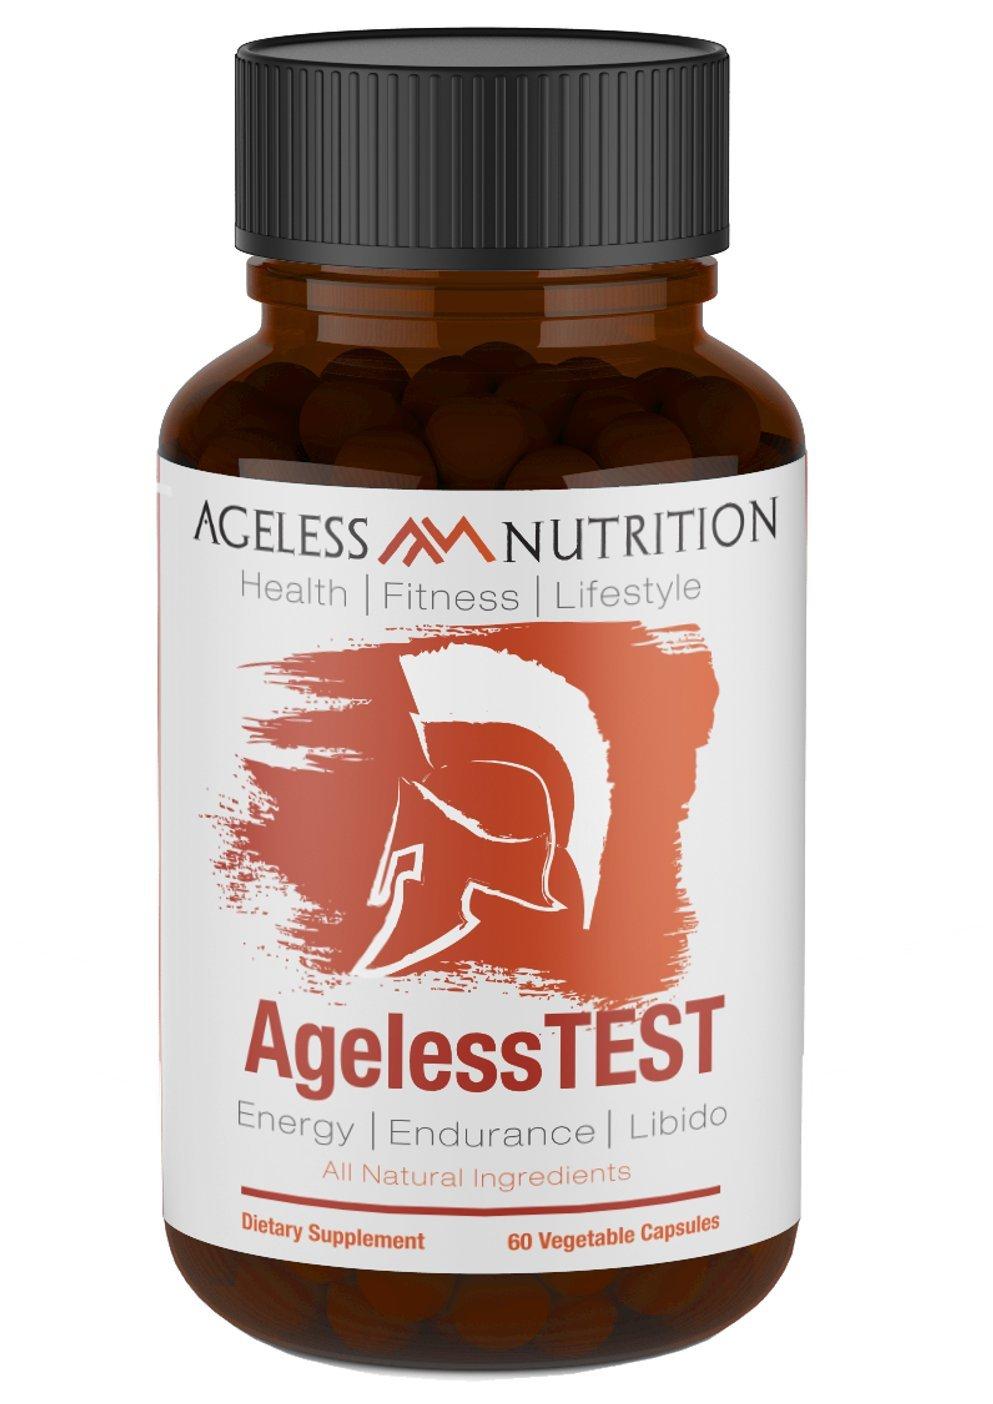 AgelessTEST - Premium Energy & Performance Enhancing Formula - All Natural Supplements, Horny Goat Weed, Vitamin D, Zinc, Tribulus Terrestris, Ashwagandha, and Fenugreek- 60 Veggie Capsules